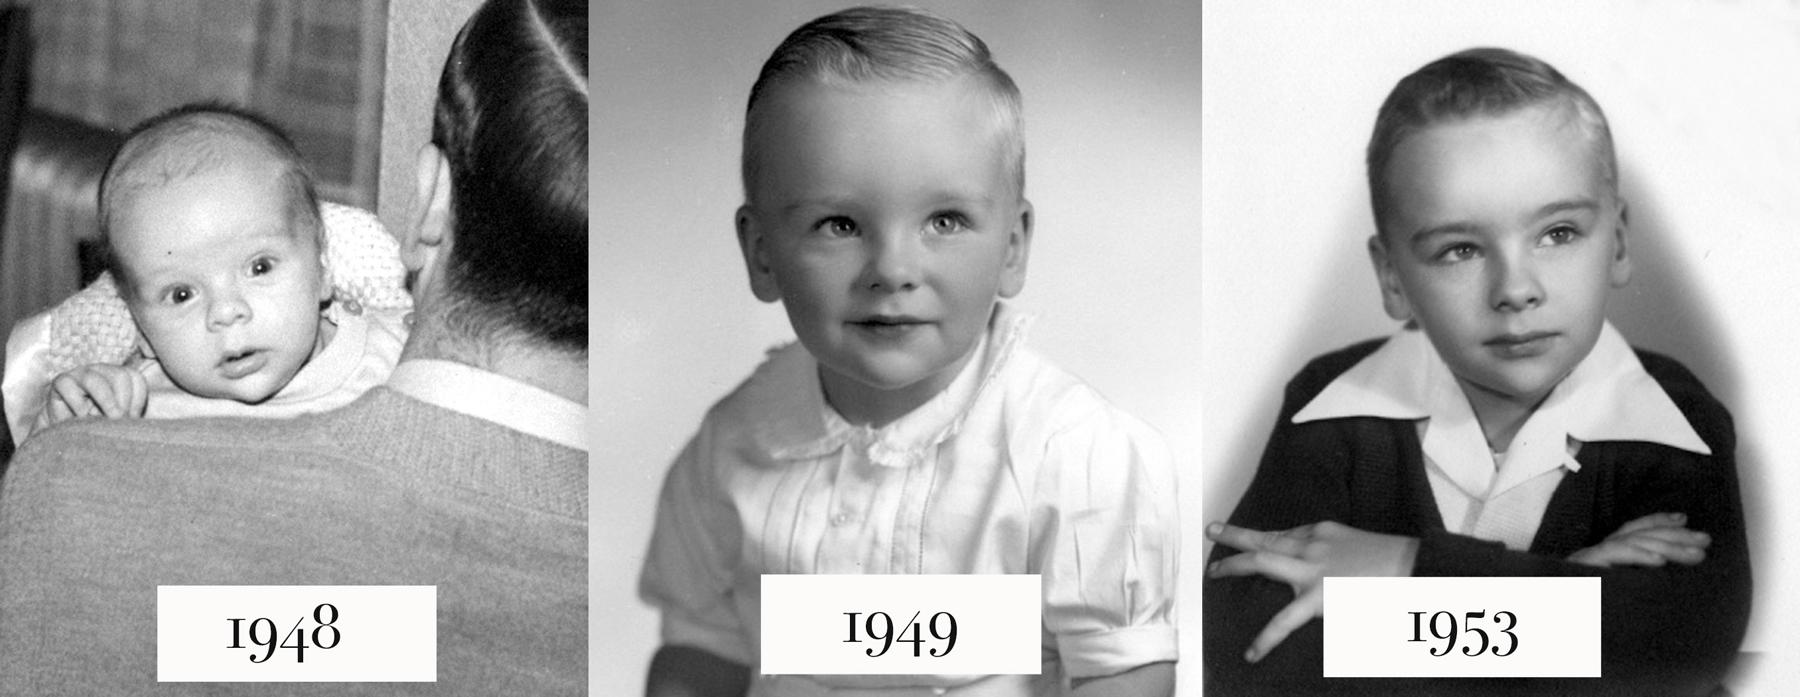 1948-1949-1953